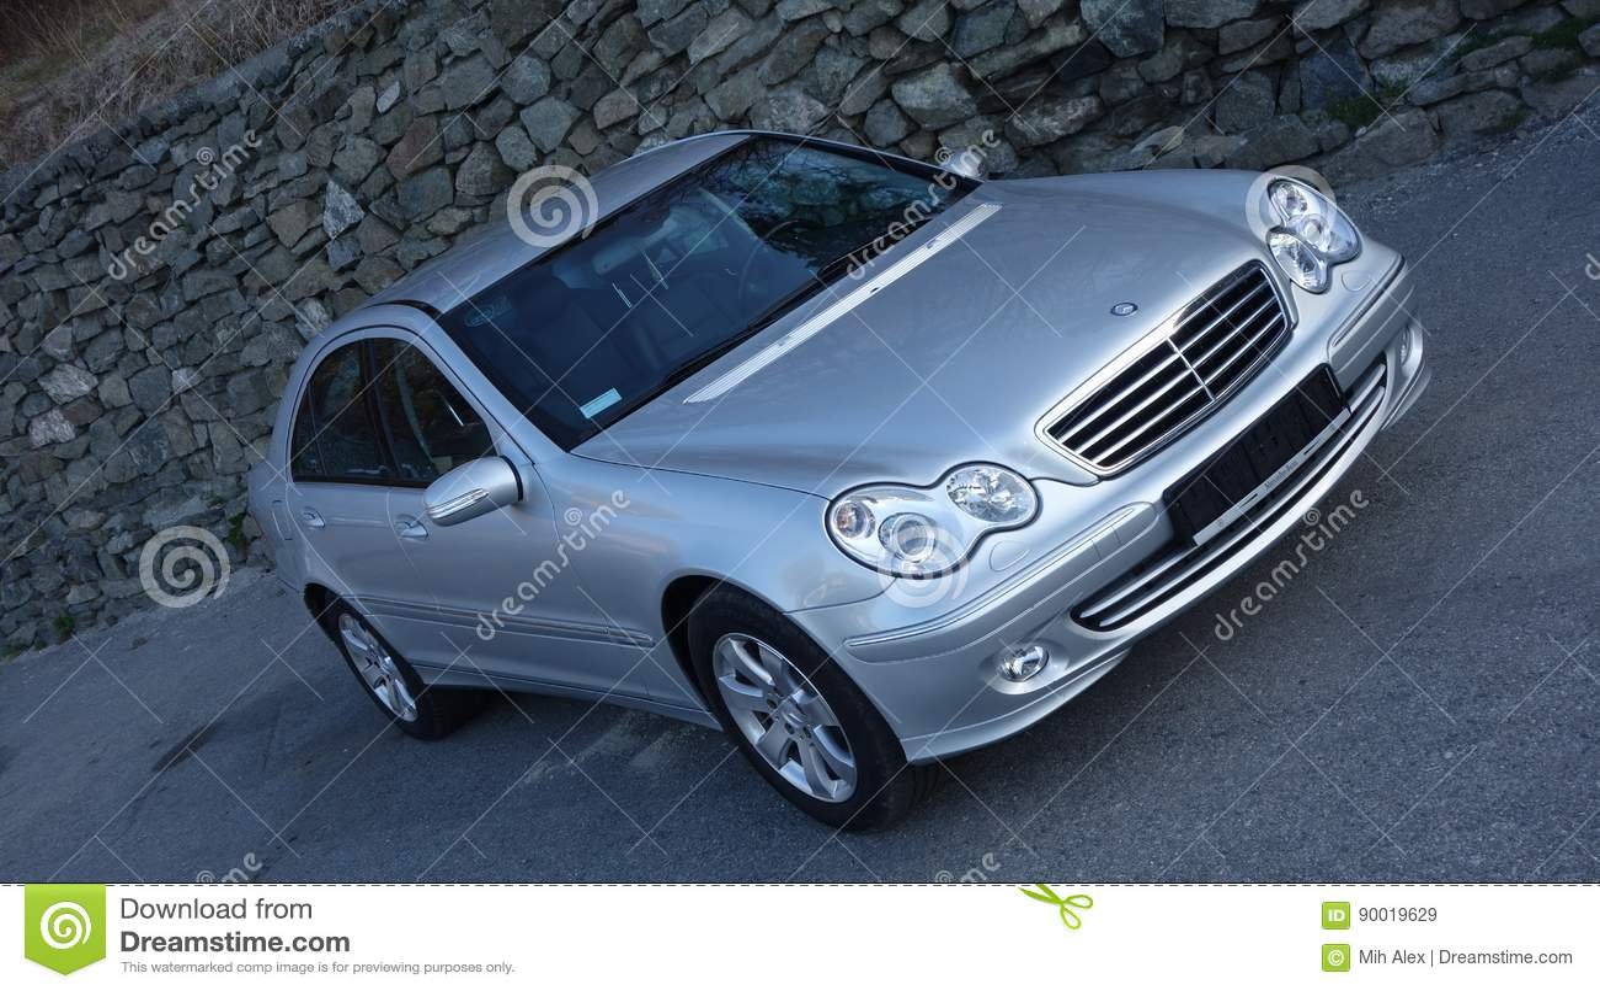 Cluj Napoca/Ρουμανία 31 Μαρτίου 2017: Benz της Mercedes W203 - το έτος 2005, εξοπλισμός πρωτοπορίας, ασημώνει το μεταλλικό χρώμα